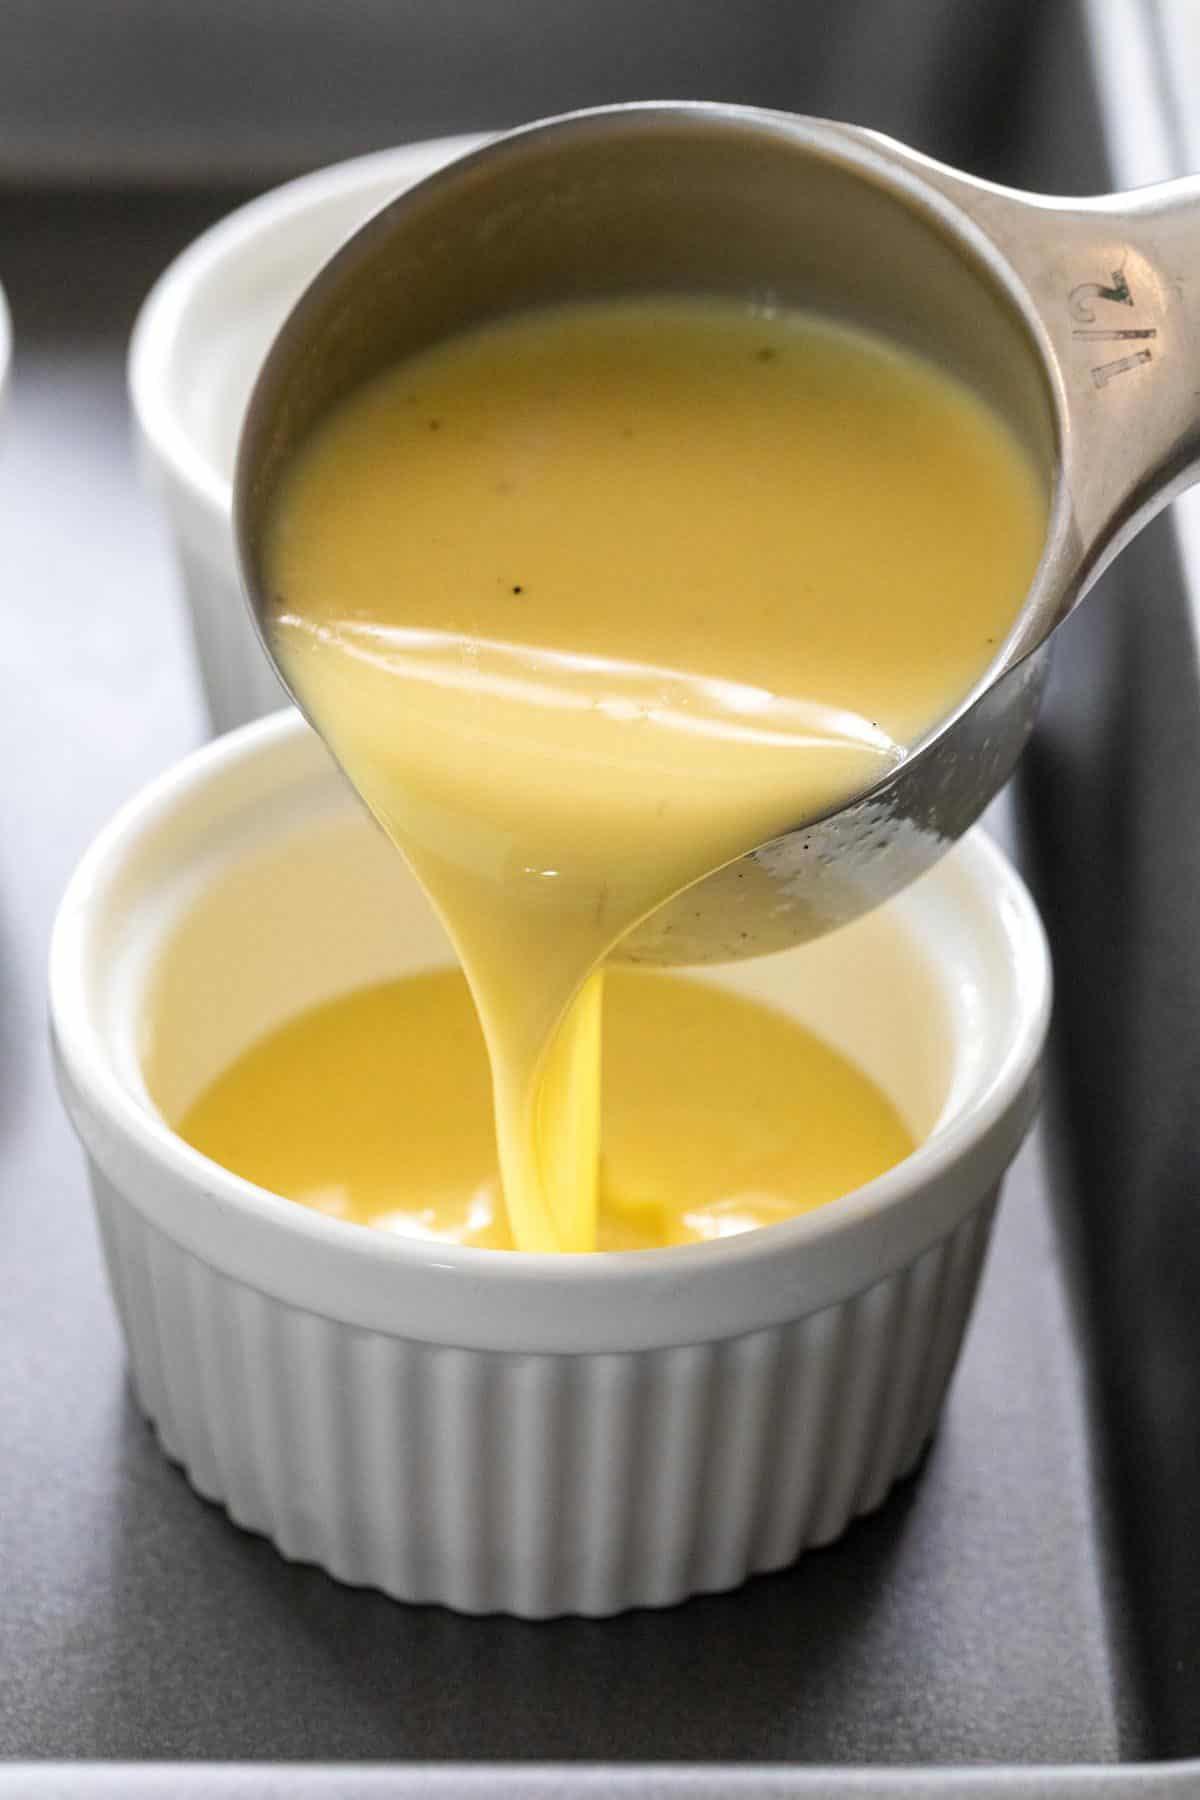 filling a ramekin with egg custard